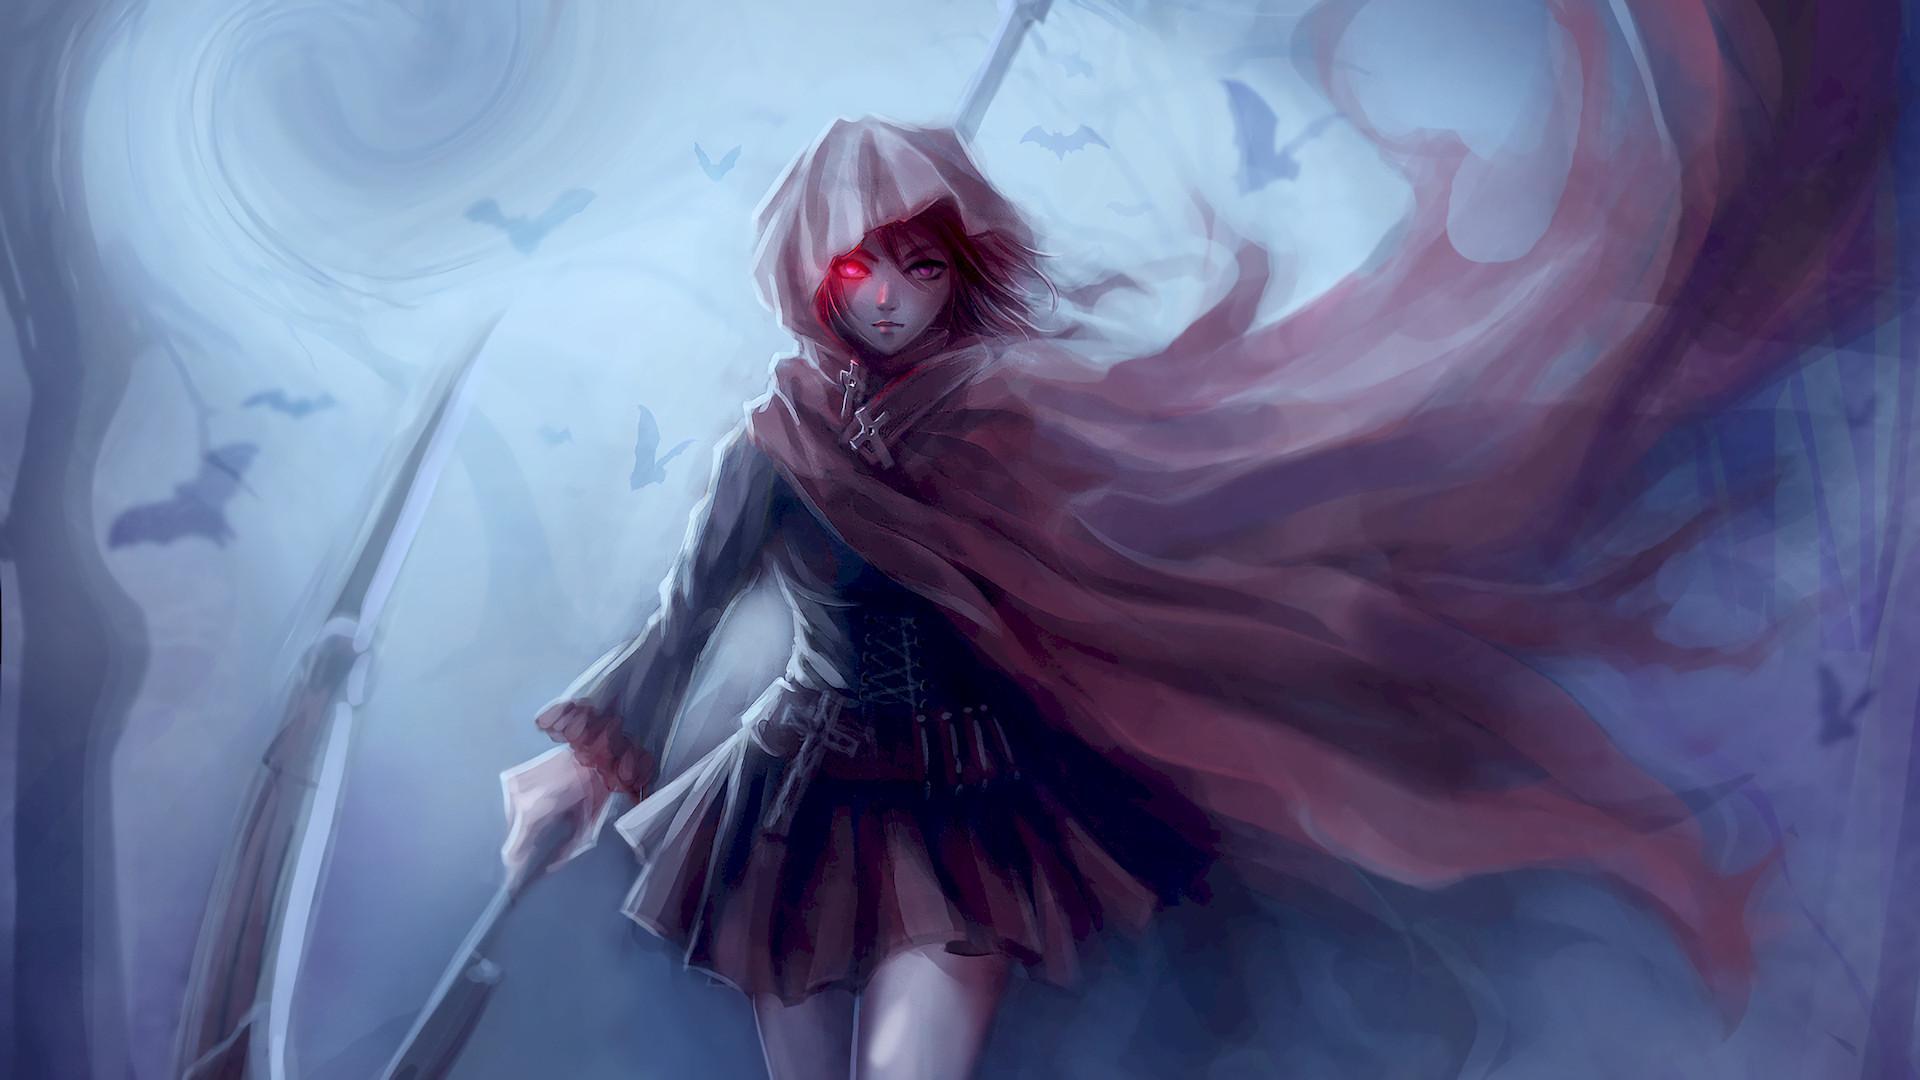 Anime – RWBY Ruby Rose (RWBY) Fantasy Woman Girl Anime Warrior Wallpaper